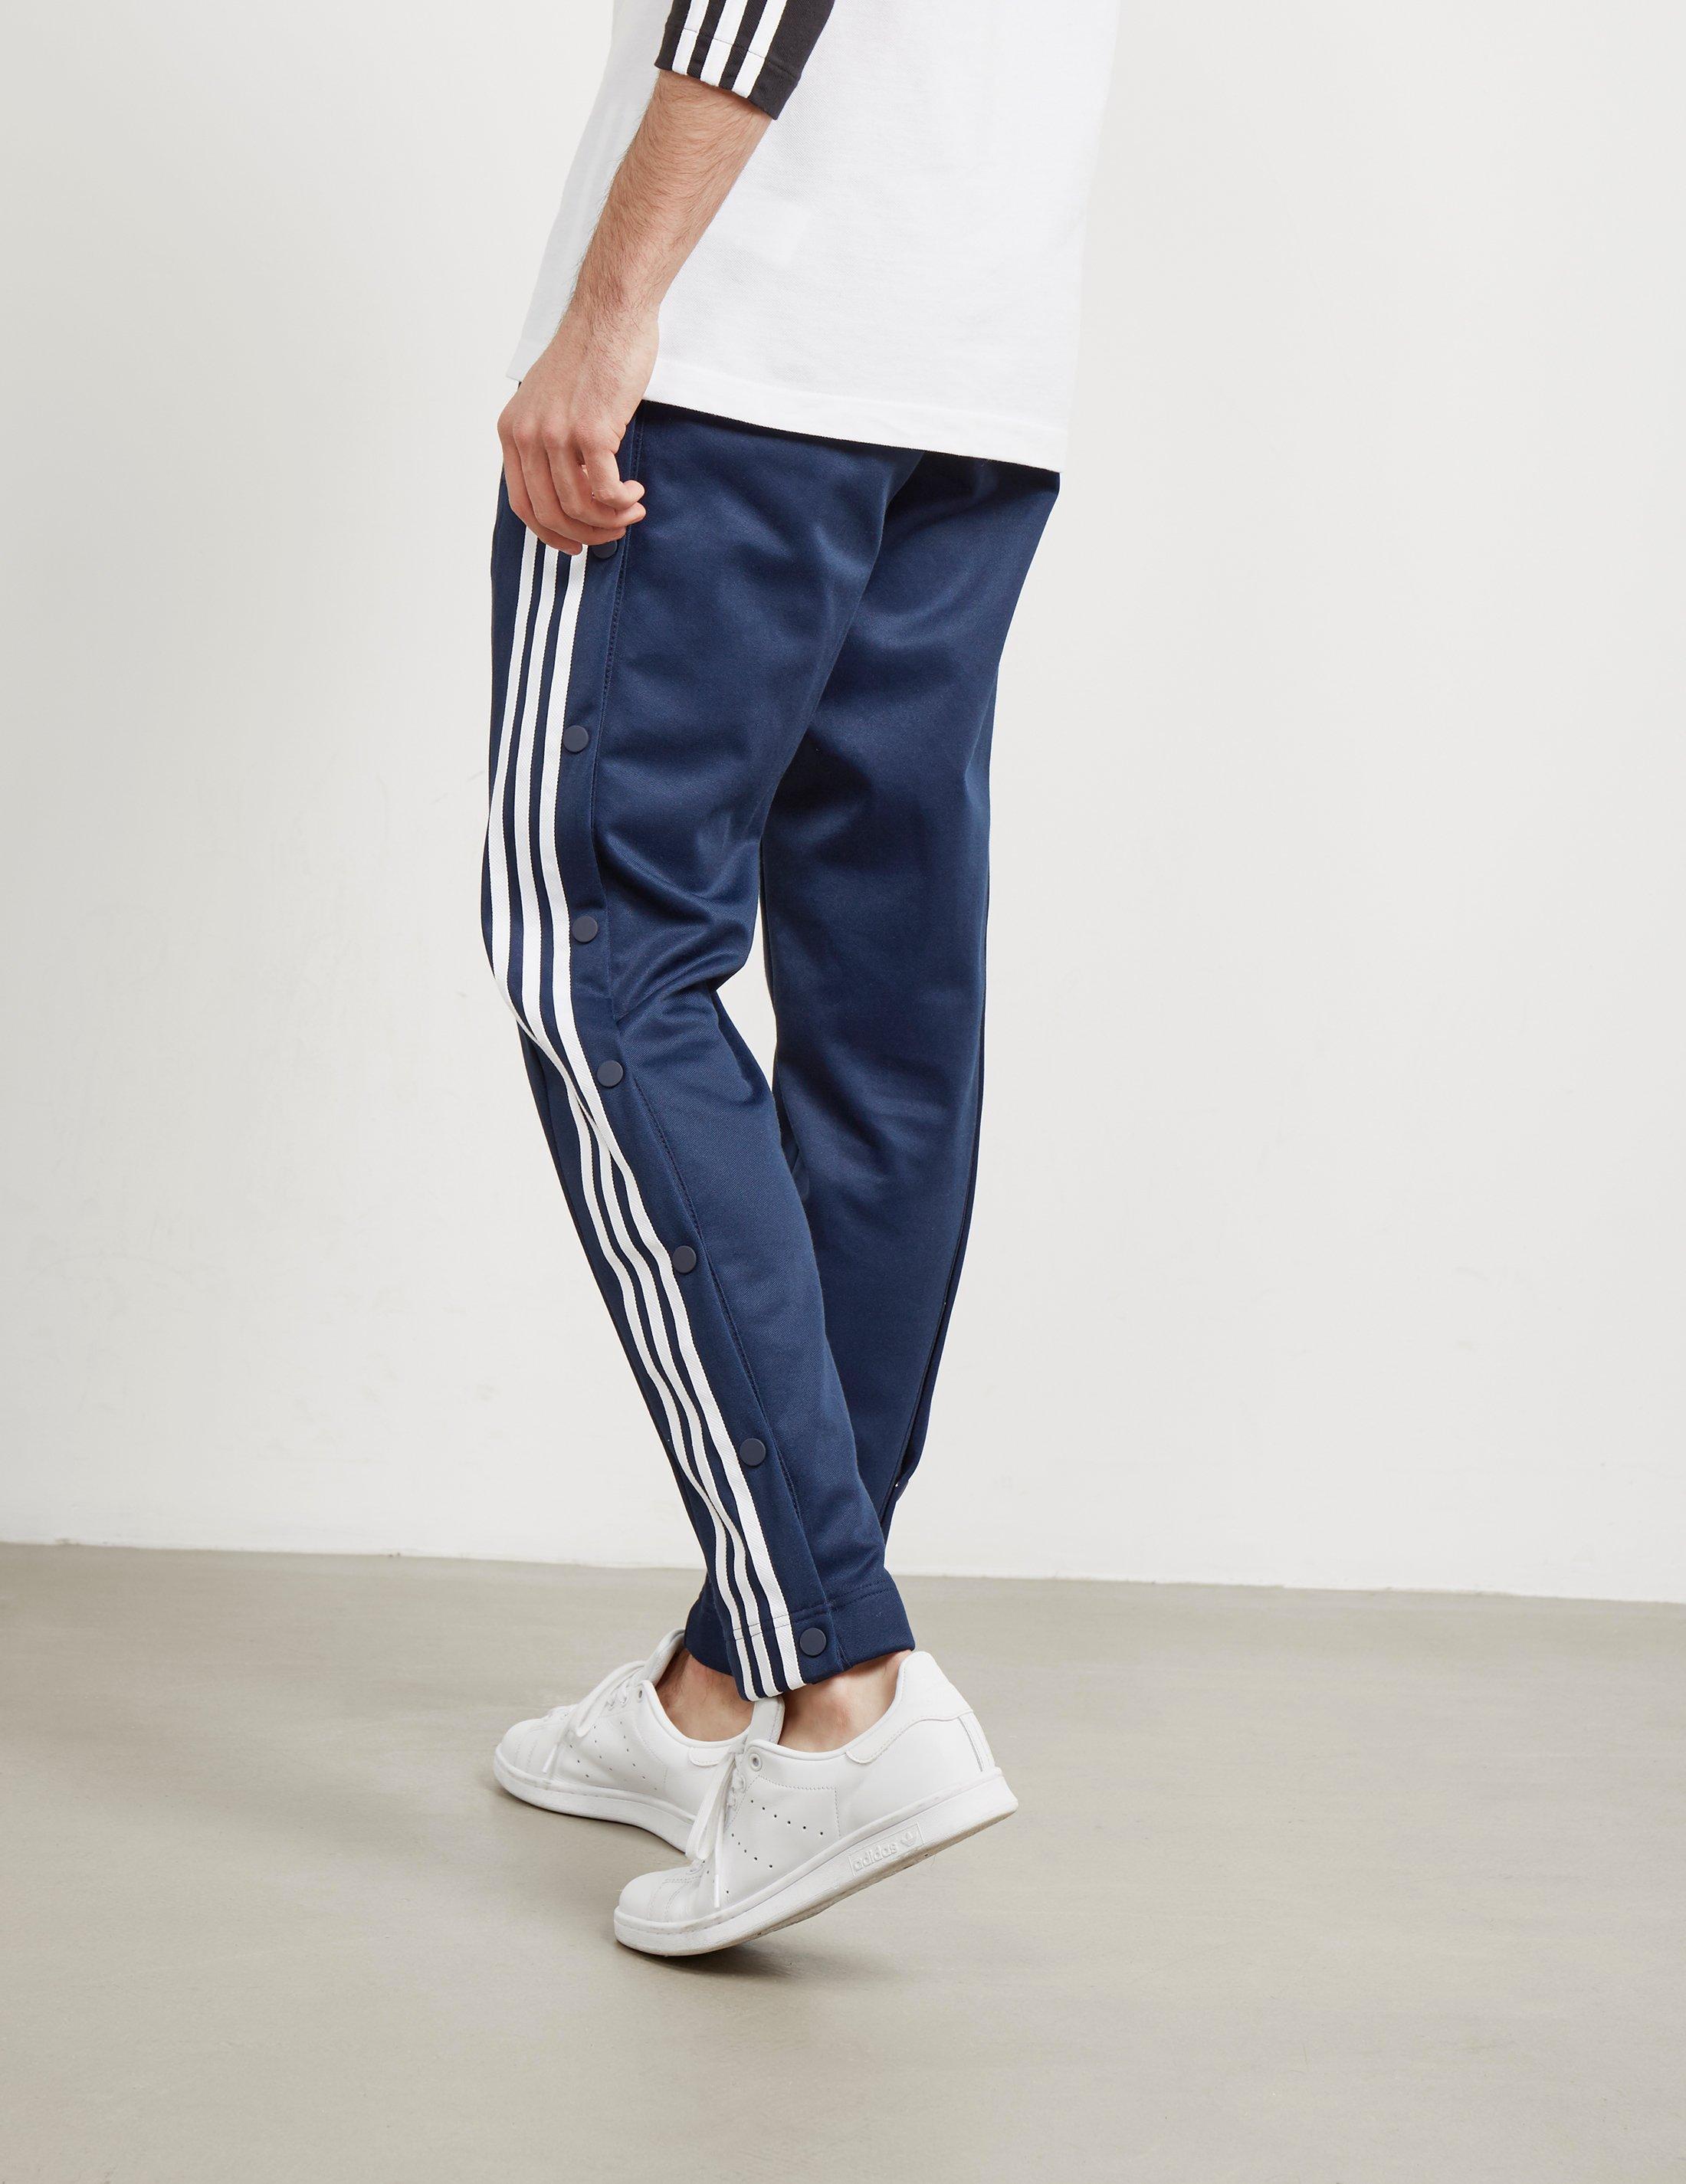 adidas Originals Cotton Mens Adibreak Snap Track Pants Navy